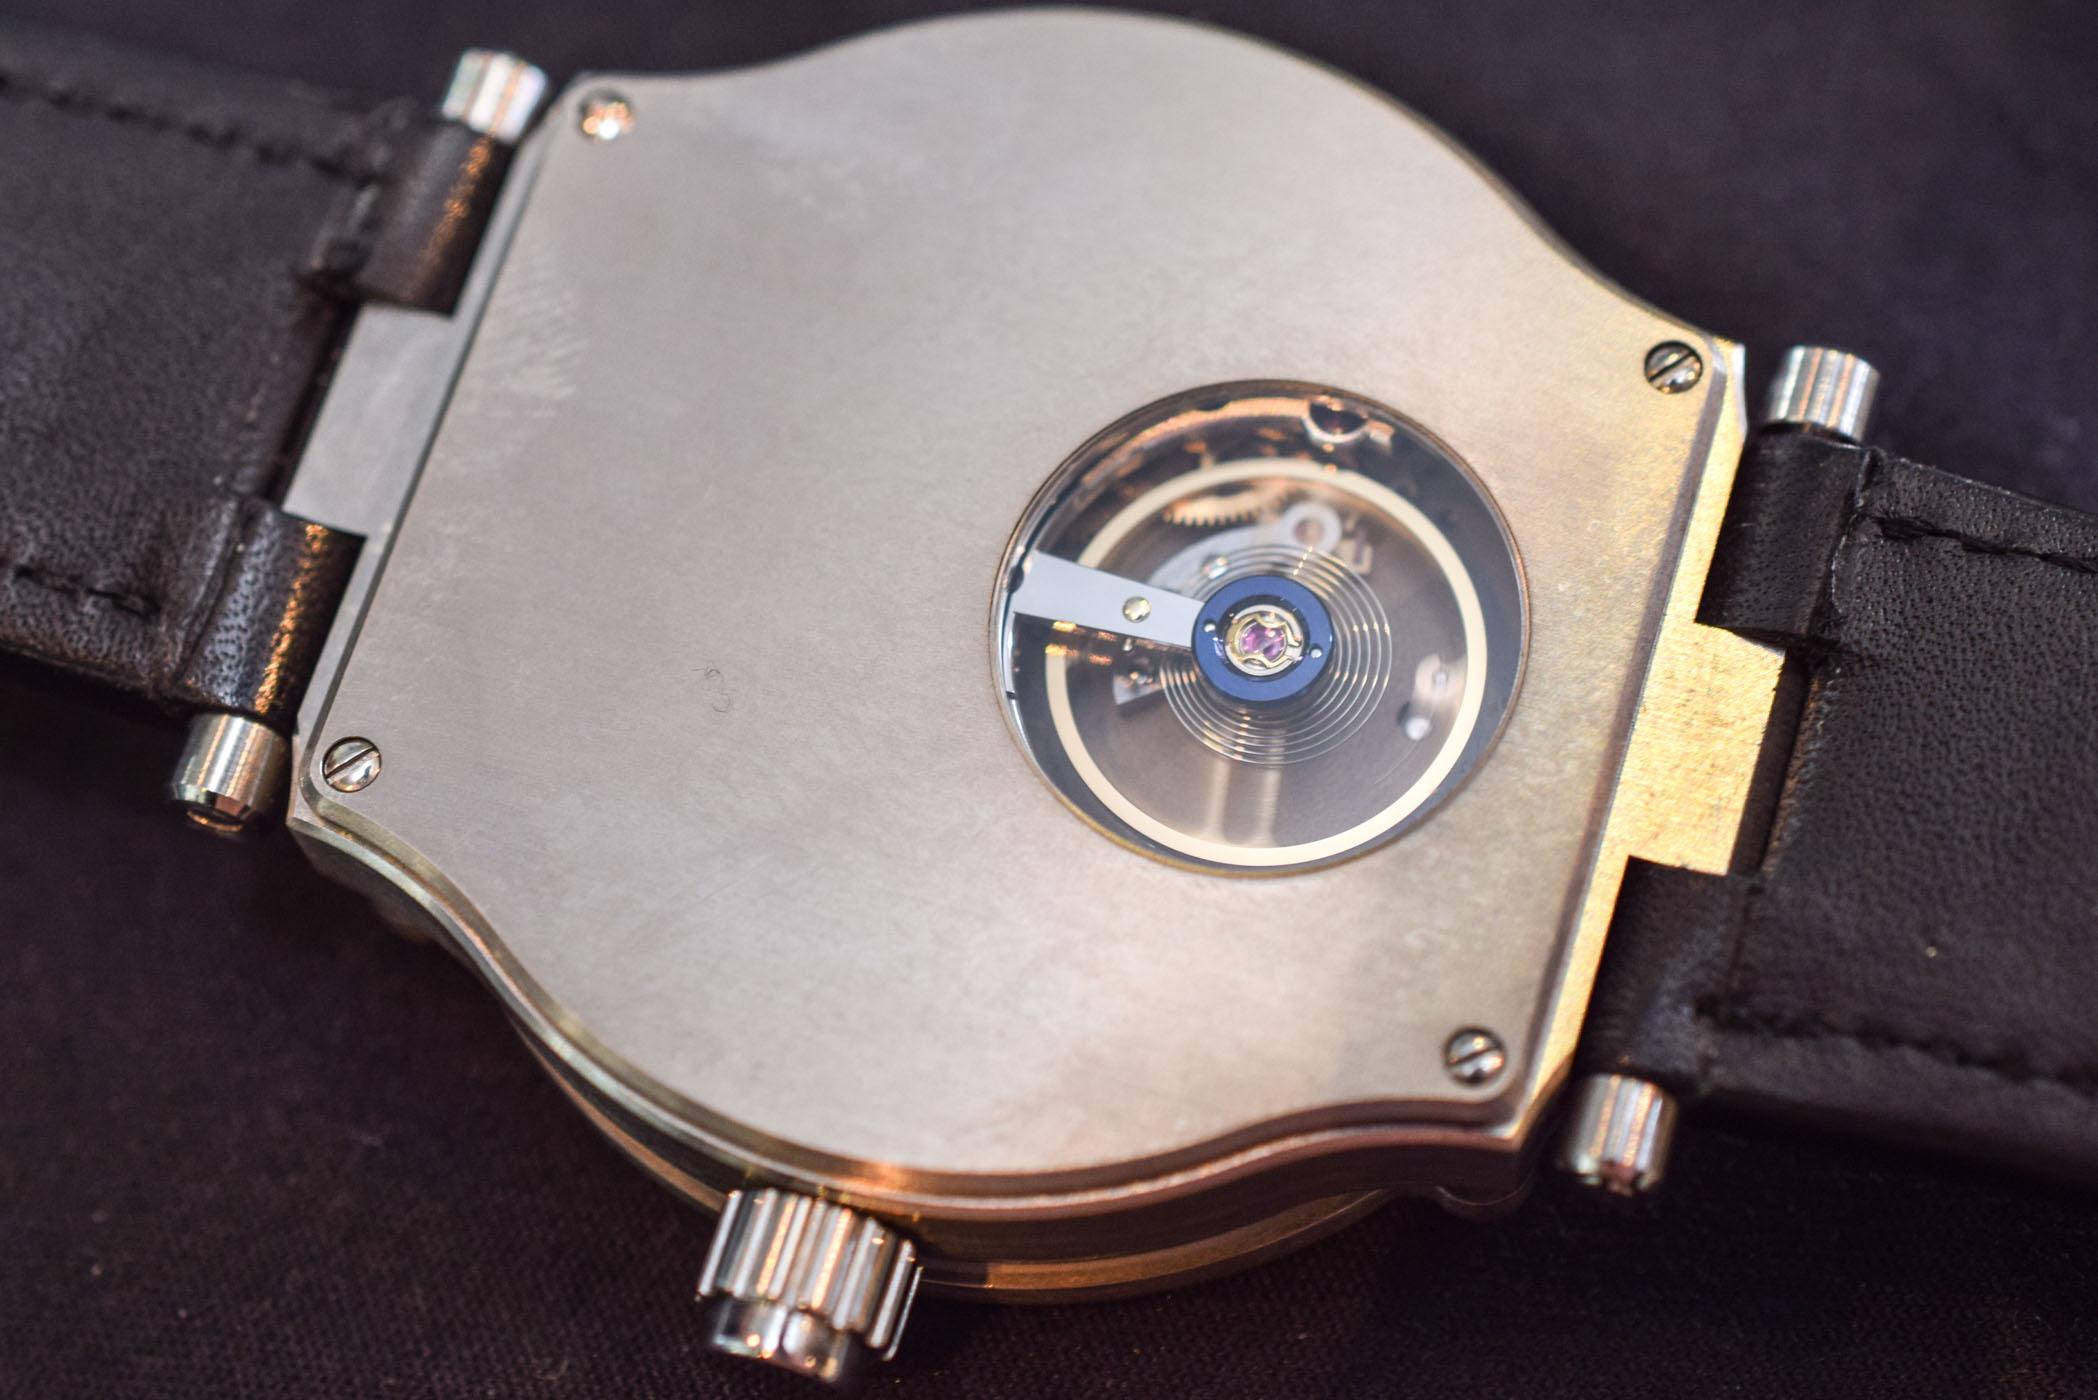 Sylvain Pinaud Chronograph Monopusher